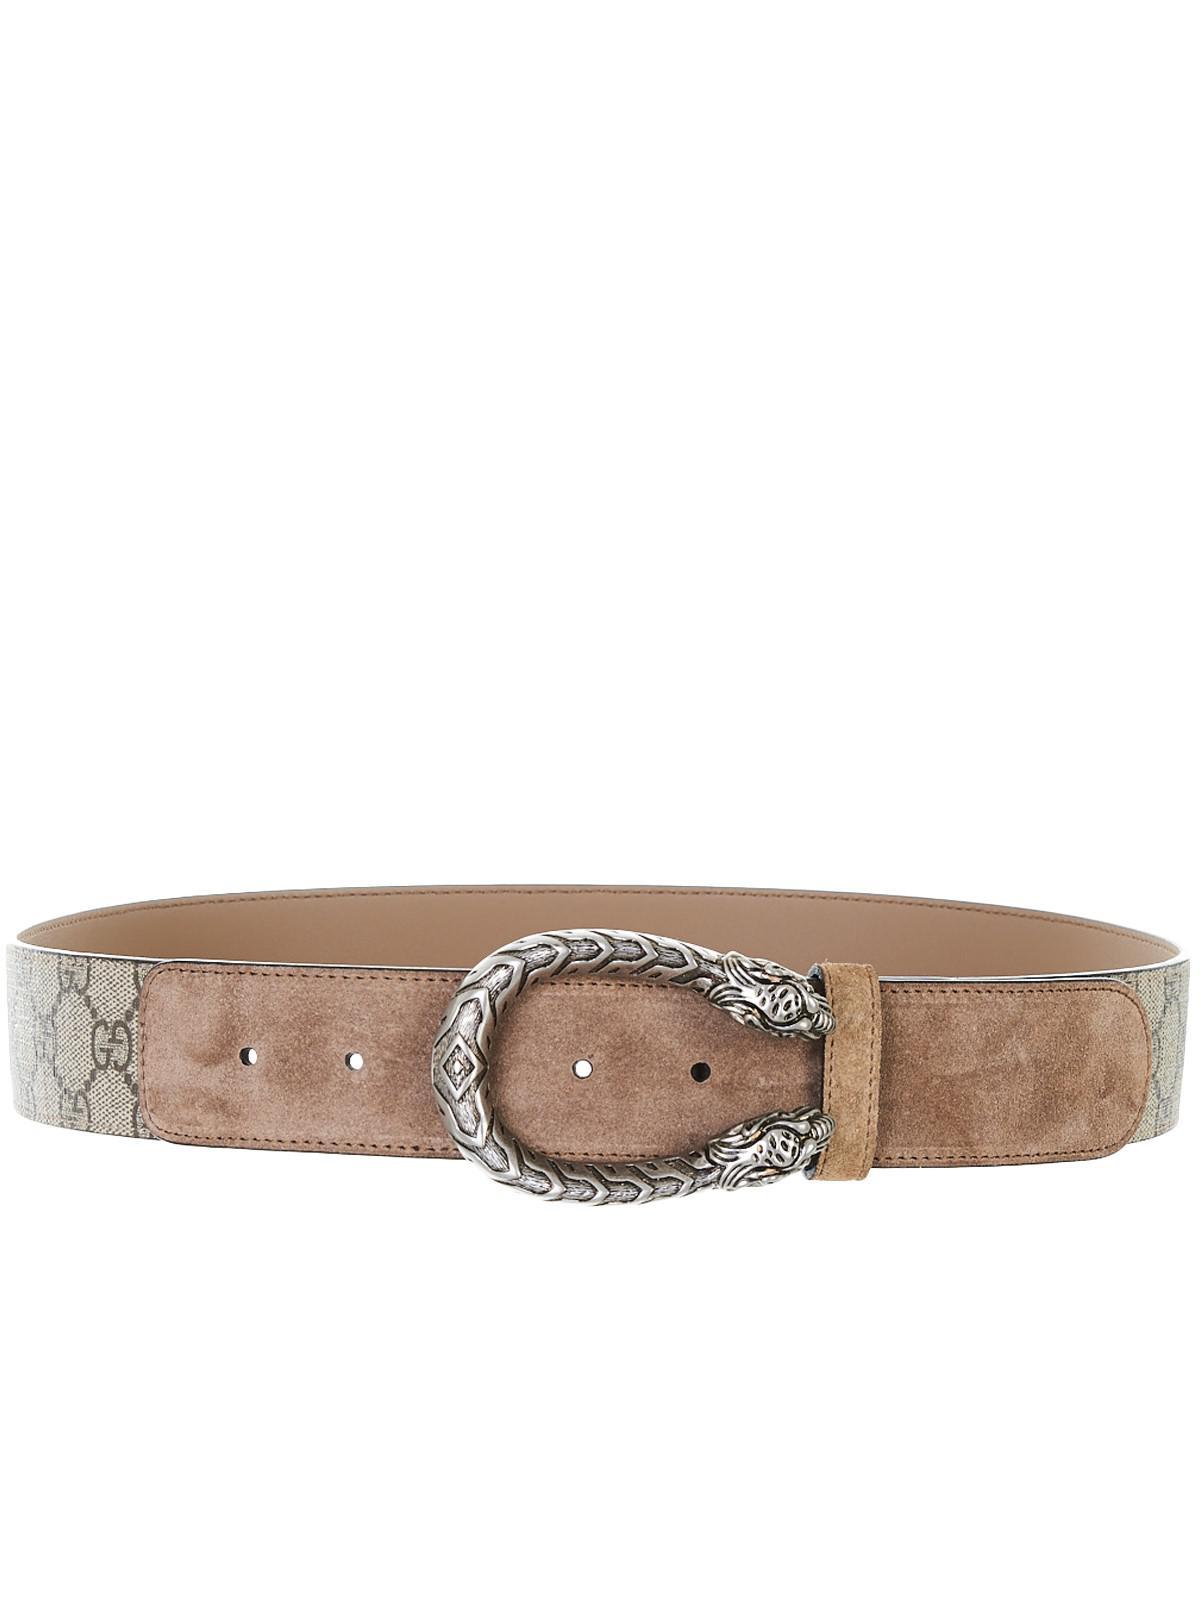 184b0bc91 Lyst - Gucci Brown Dionysus Belt in Brown